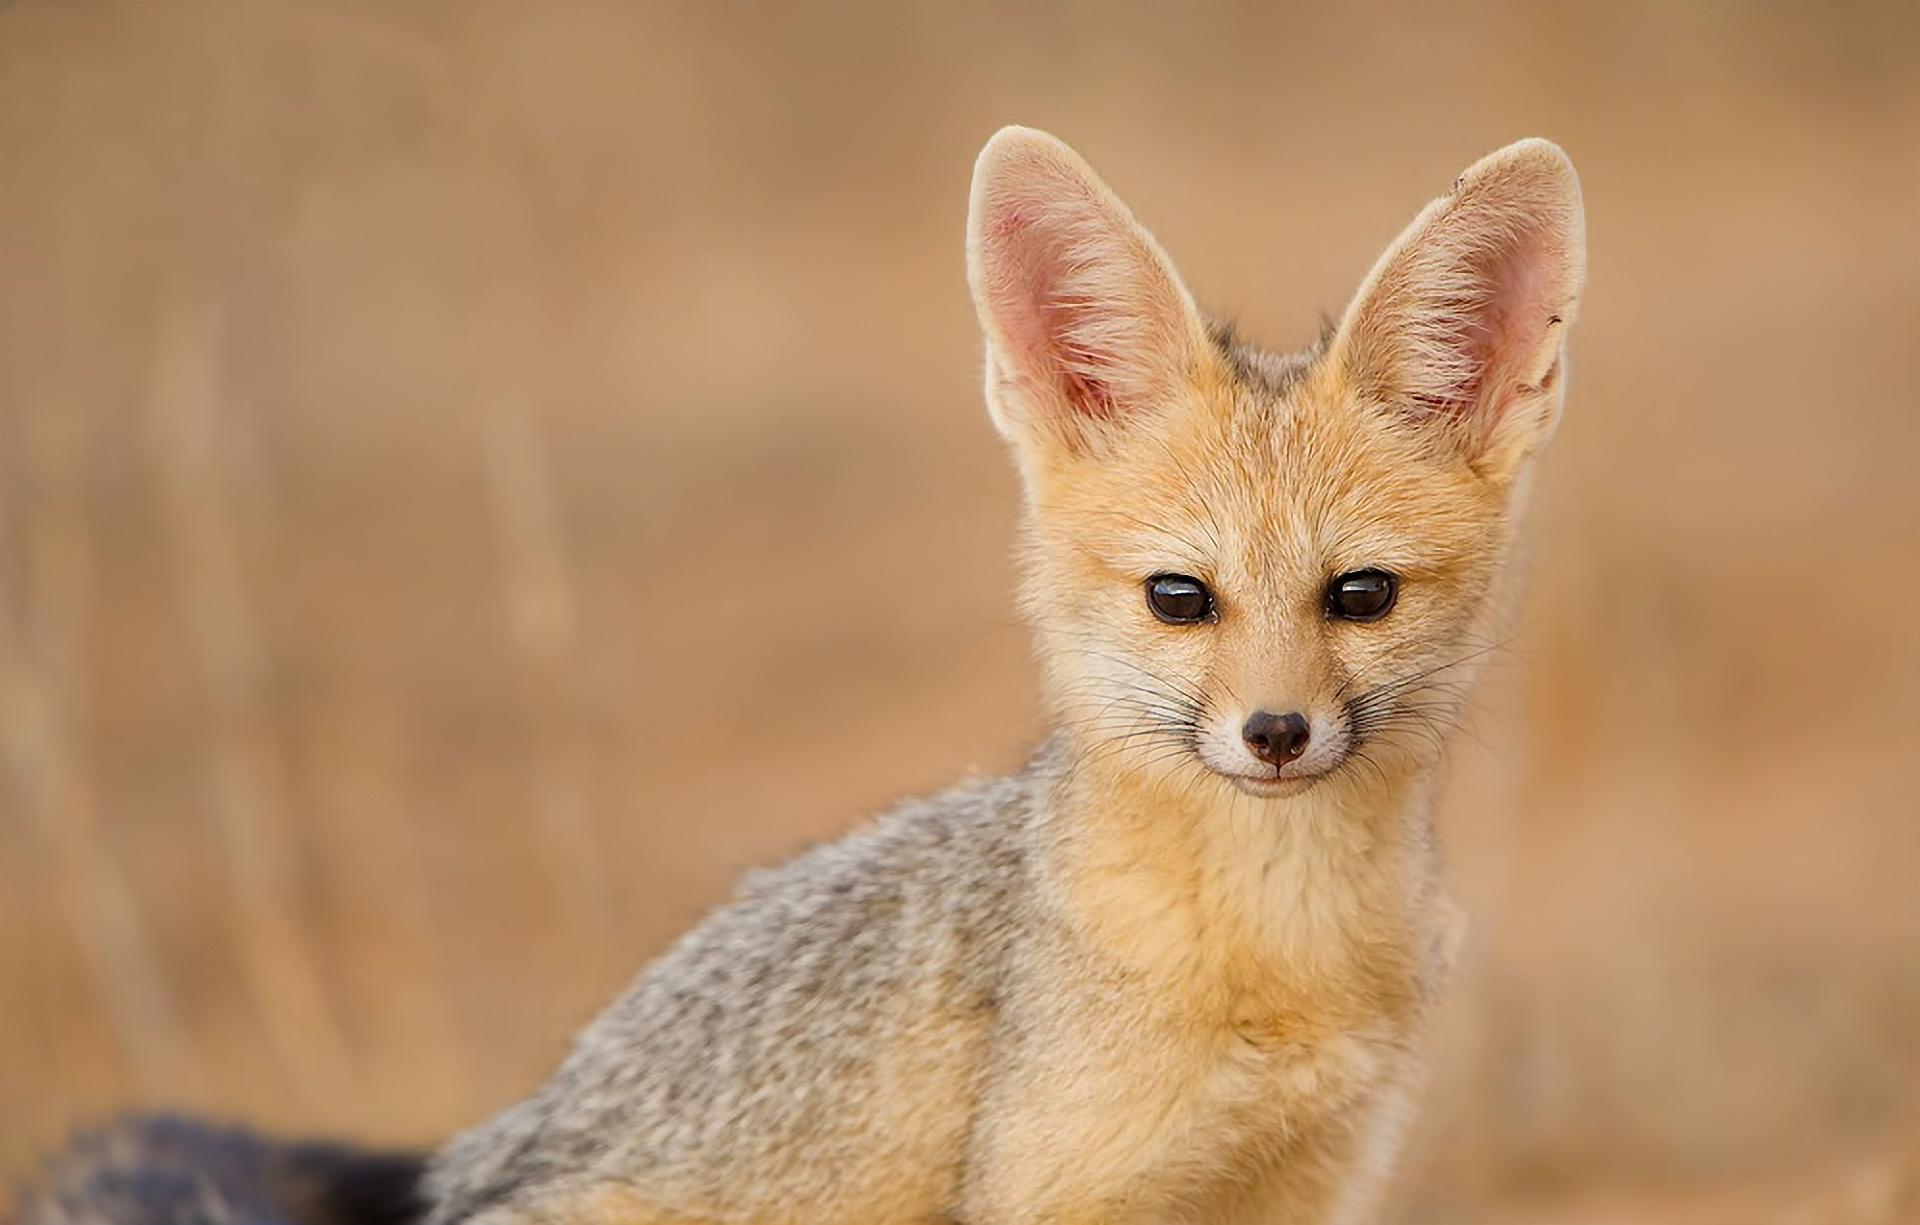 yuzhnoafrikanskaya lisica1 Южноафриканская лисица